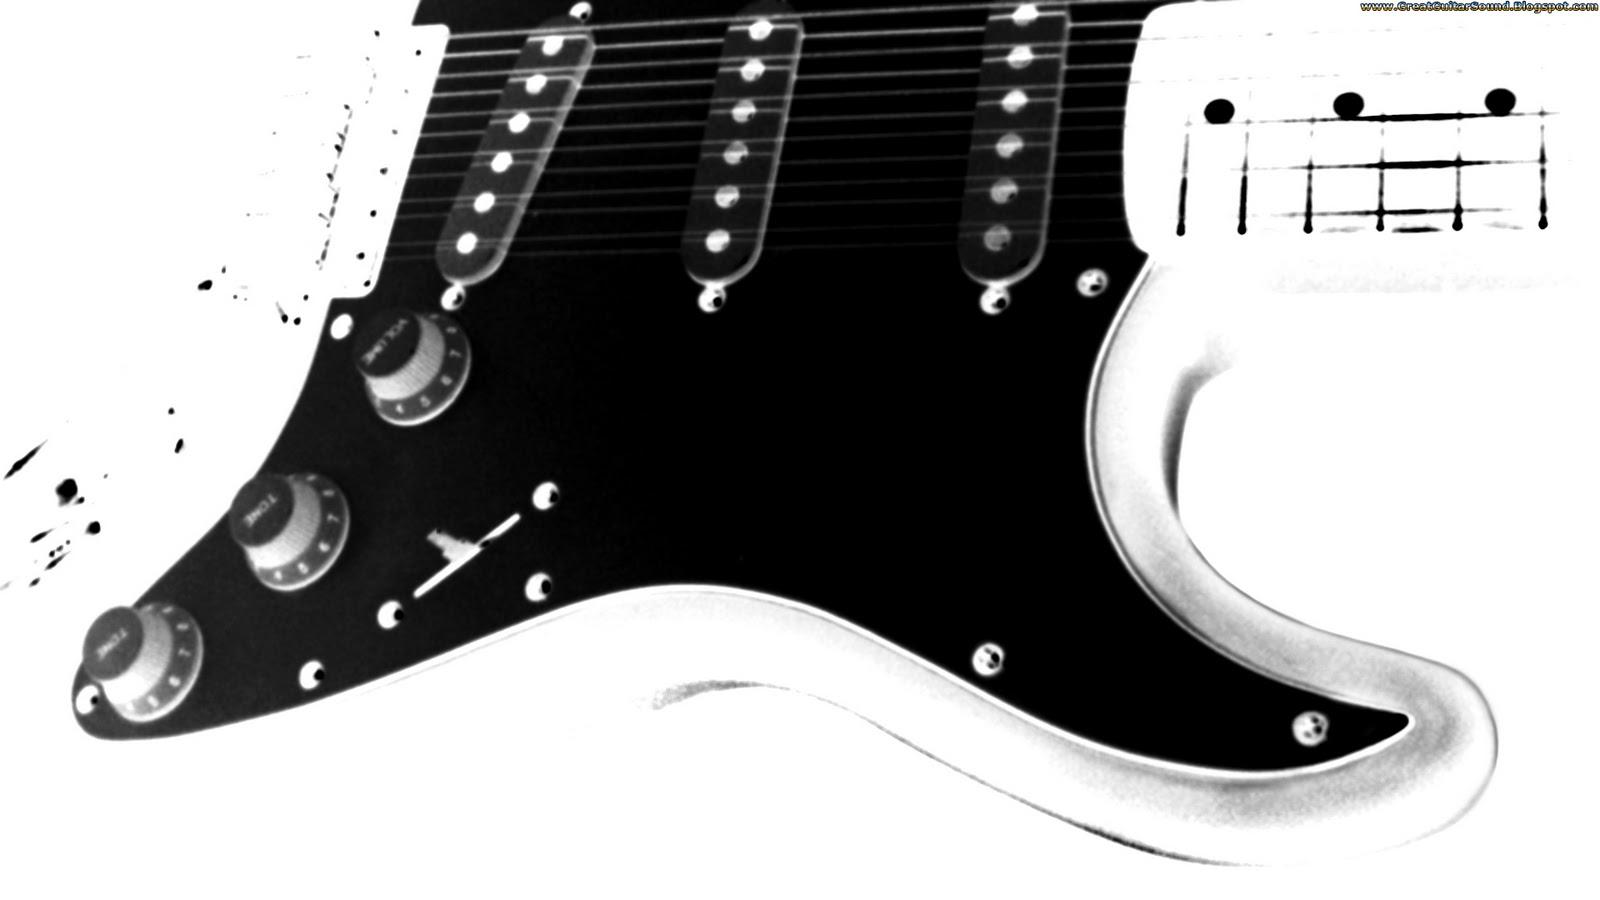 great guitar sound guitar wallpaper white and black fender stratocaster electric guitar. Black Bedroom Furniture Sets. Home Design Ideas